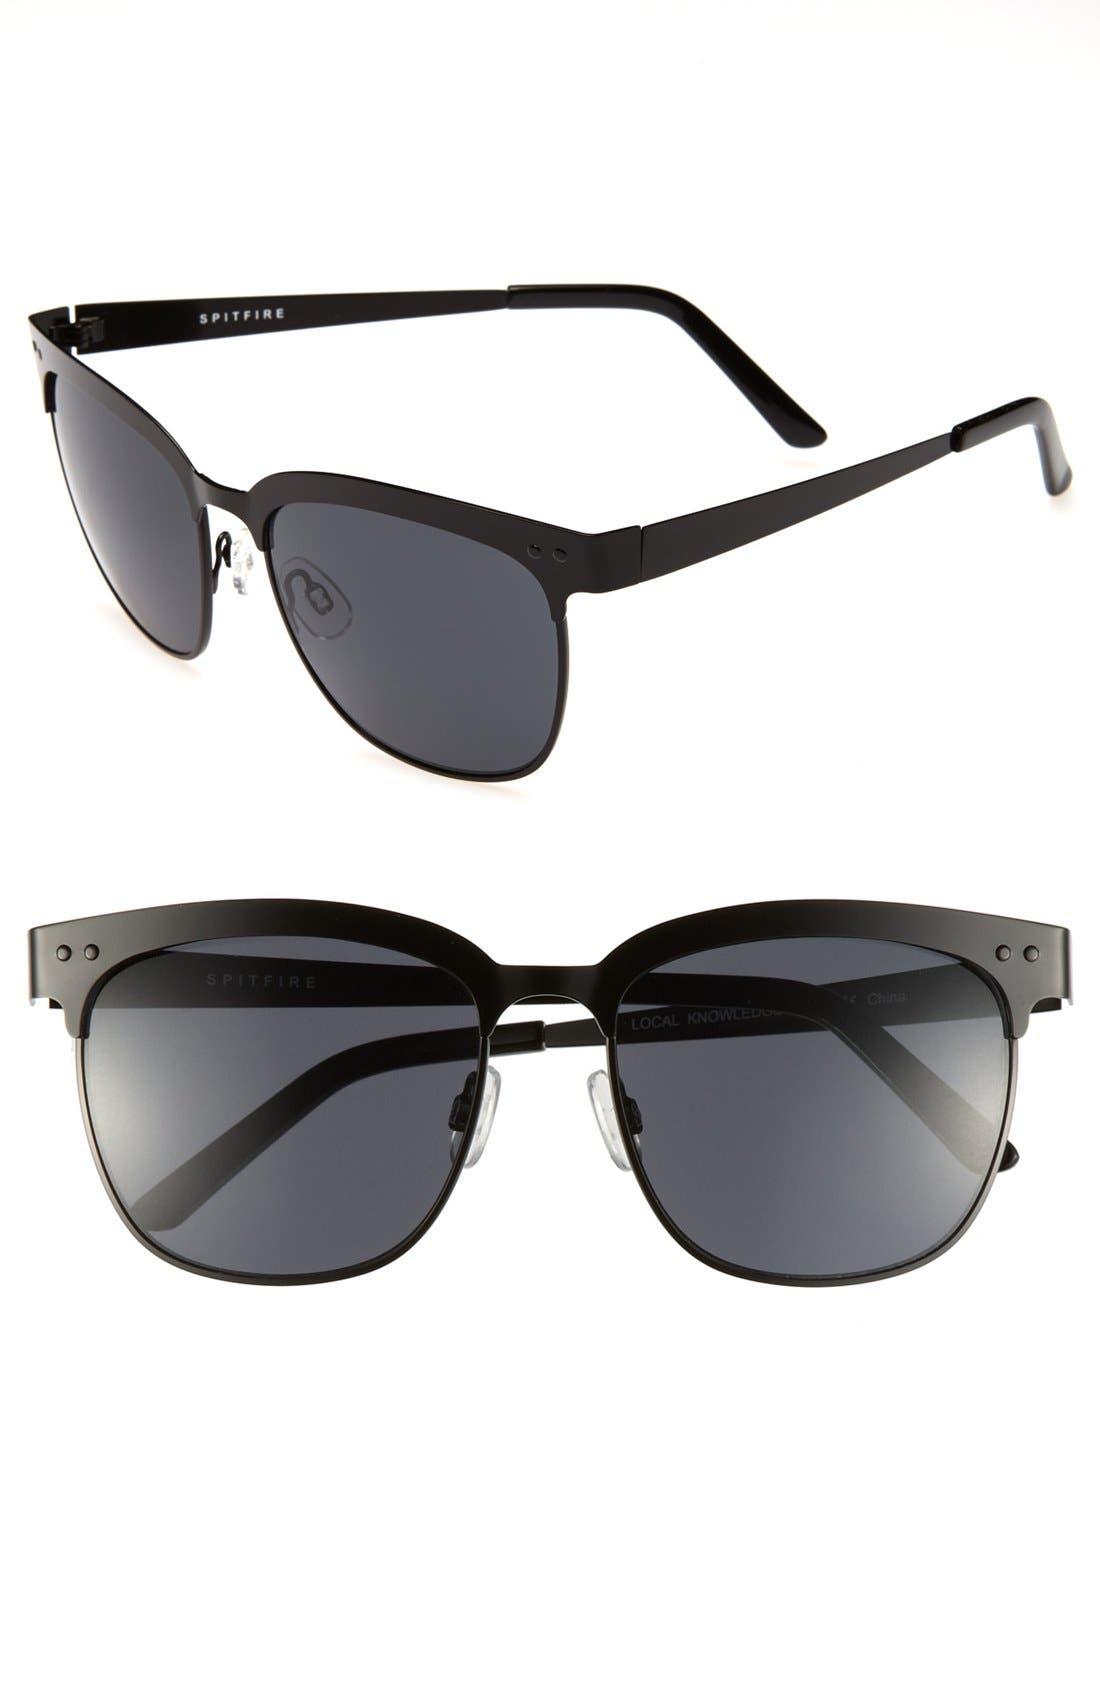 Main Image - Spitfire 'Local Knowledge' Sunglasses